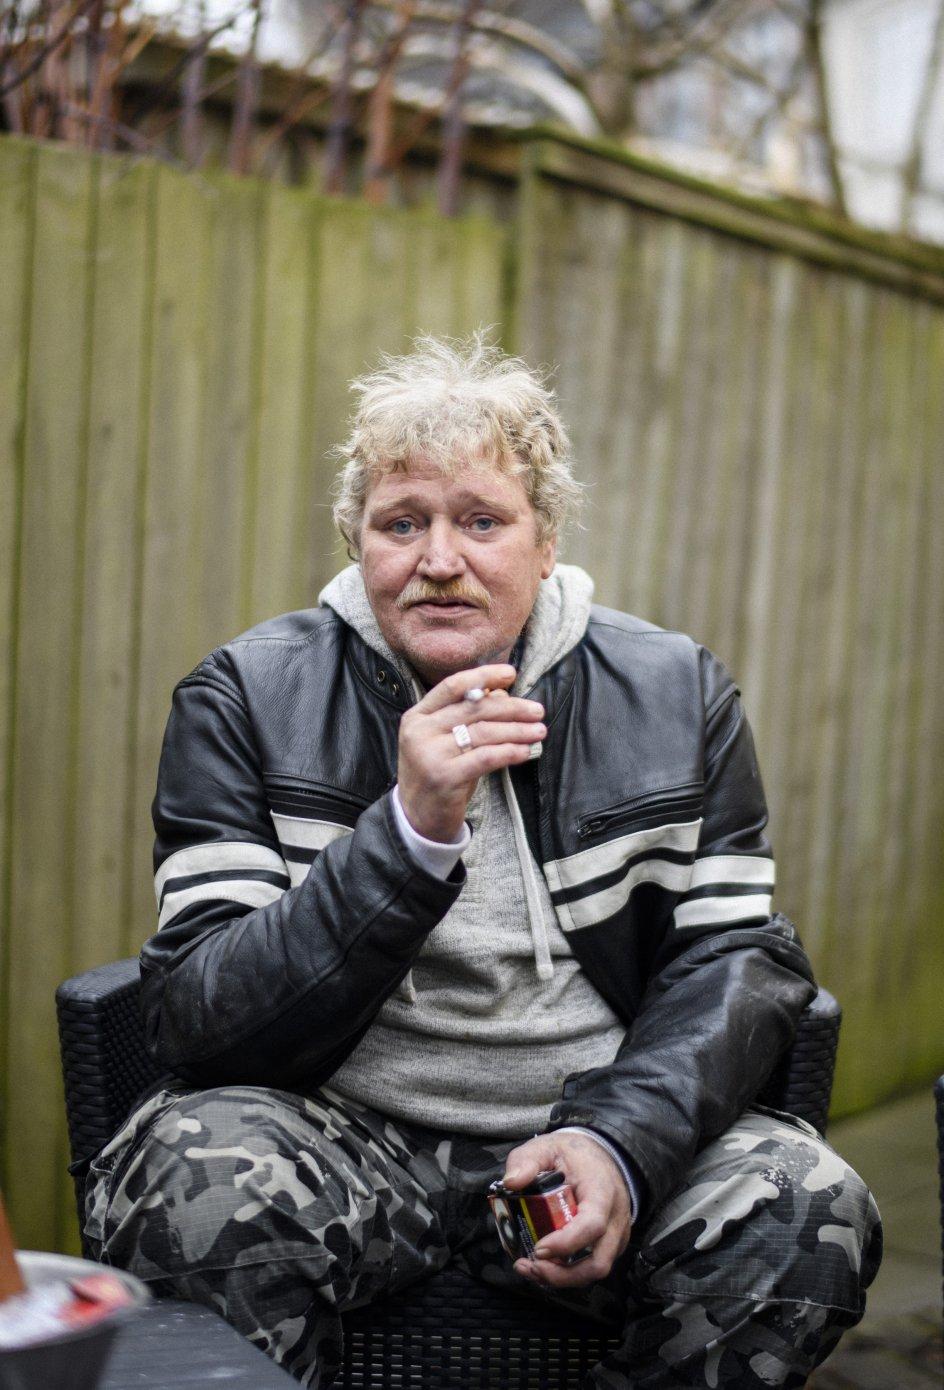 Andrew Juk Kristensen har været musiker i Aarhus. I dag er han førtidspensionist, og han har netop mistet sin hustru gennem 36 år.